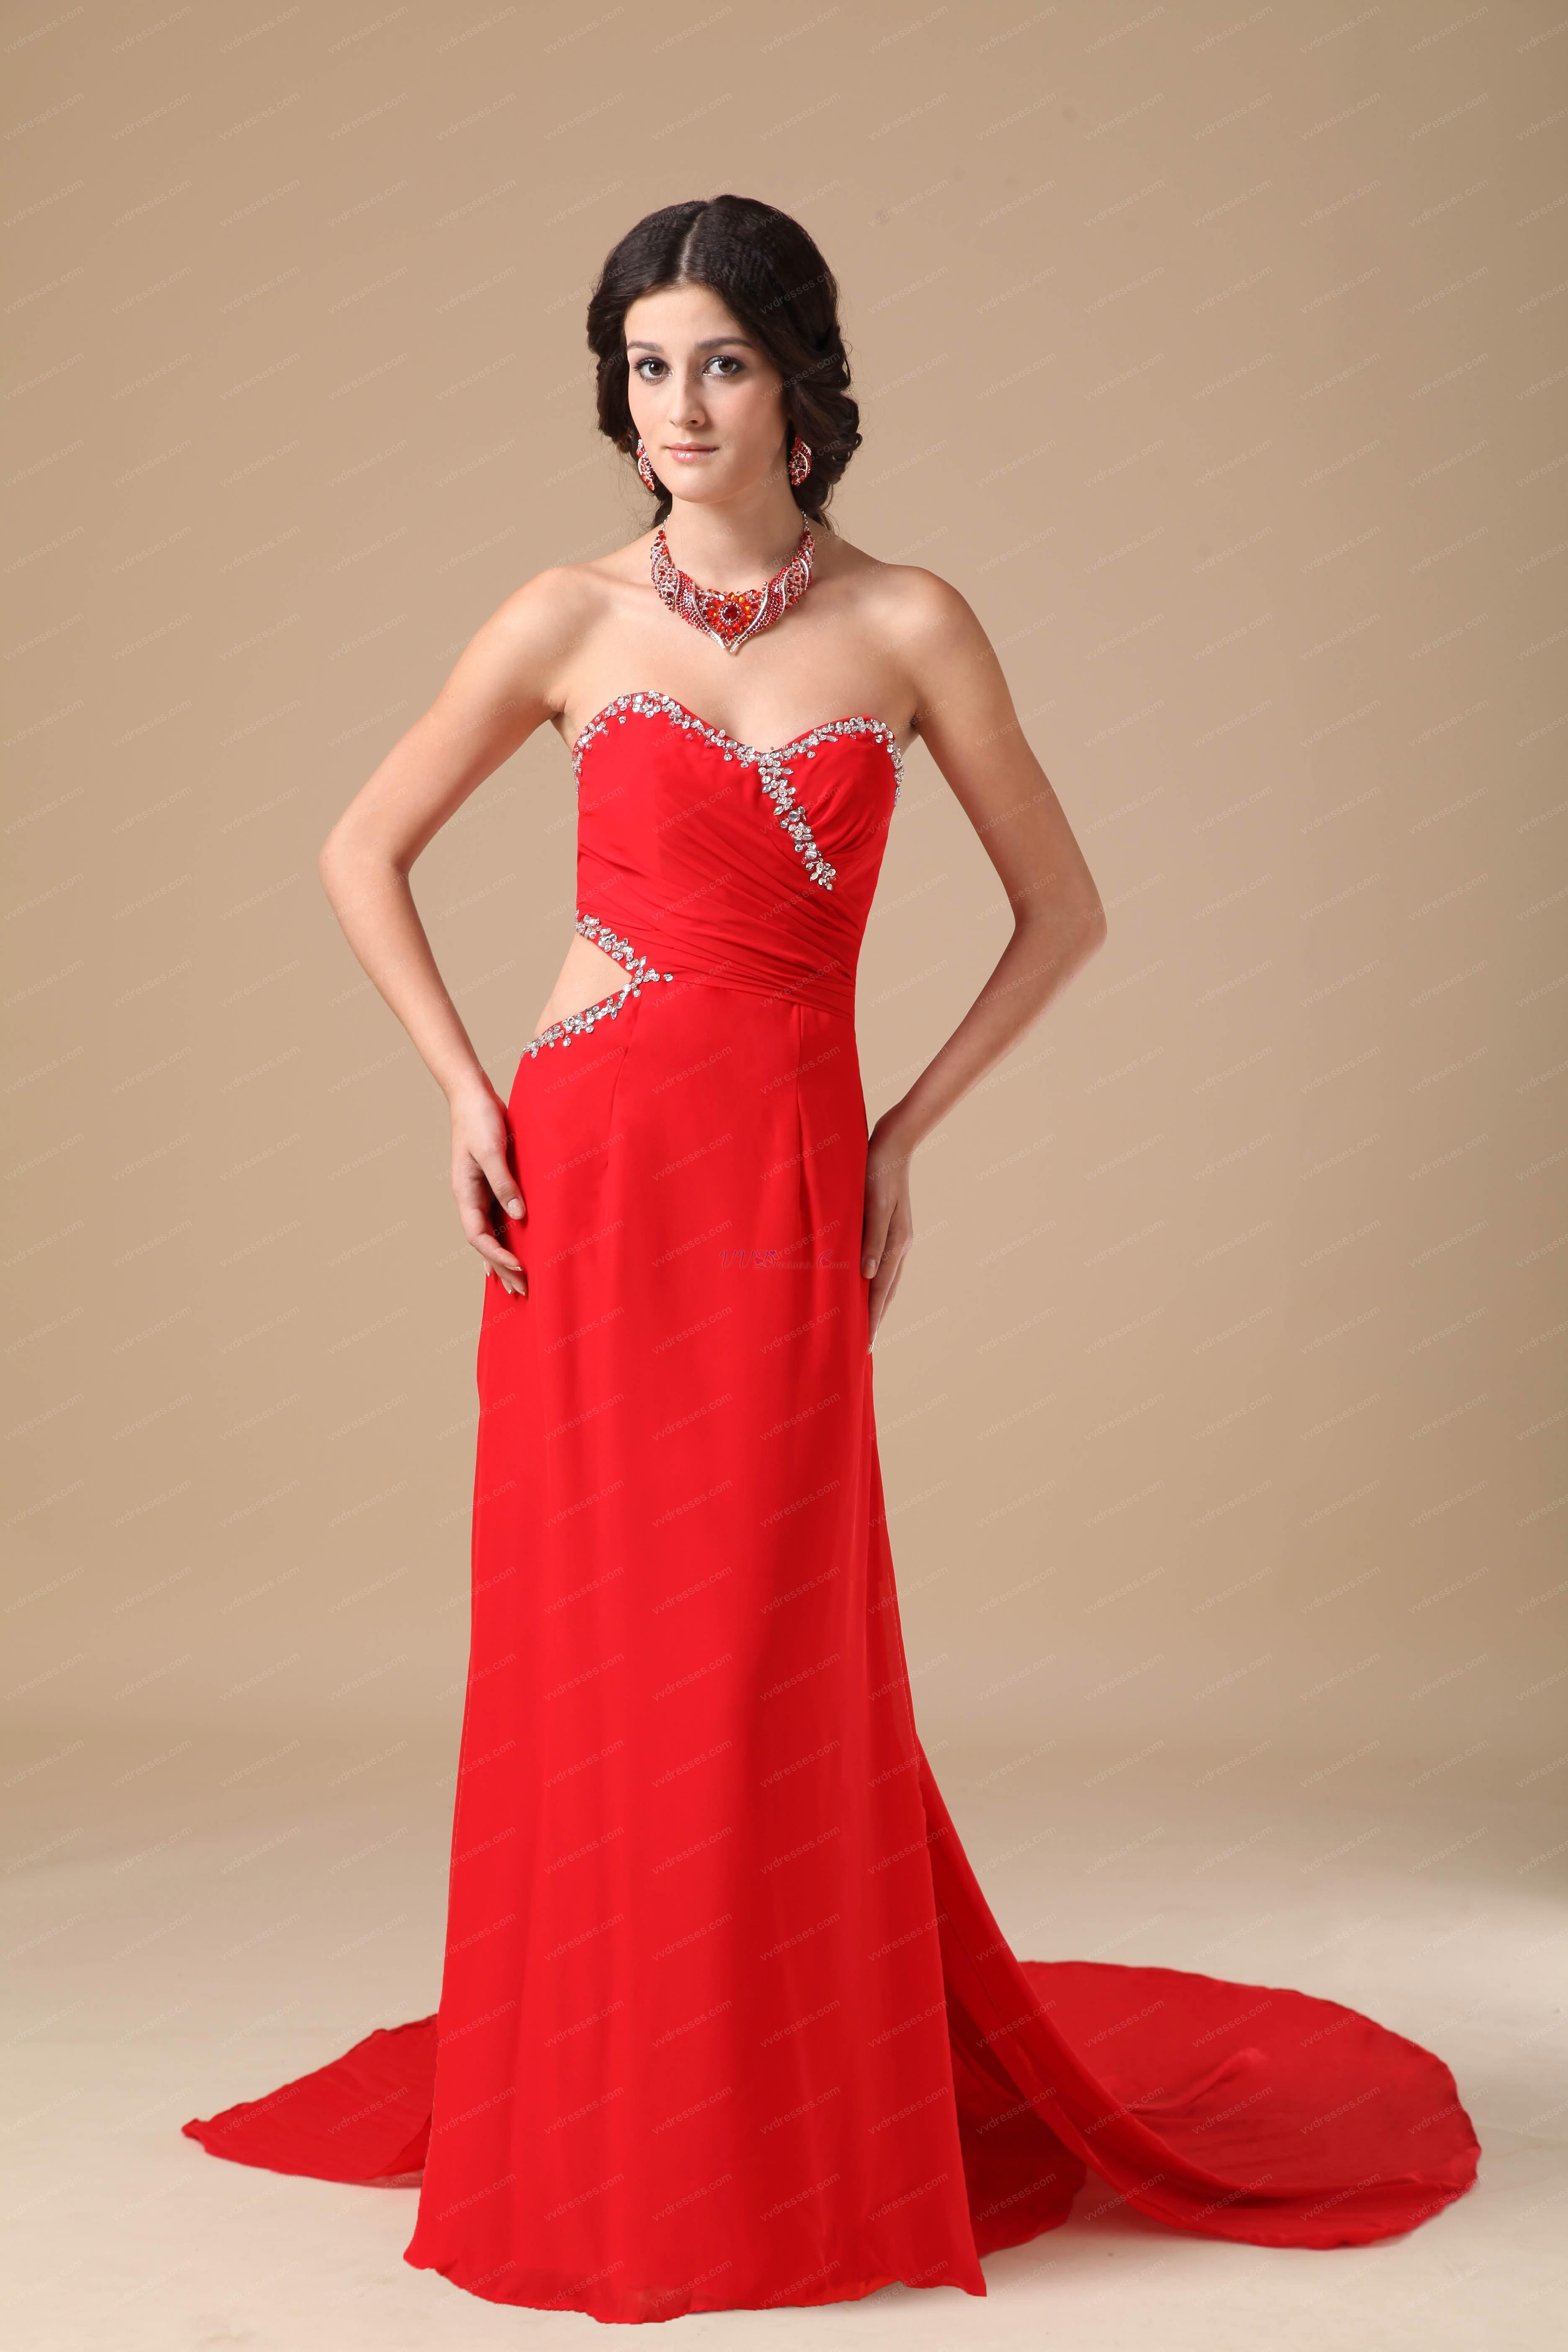 Normal Red Chiffon Split Prom Dance Dress With Panel Train